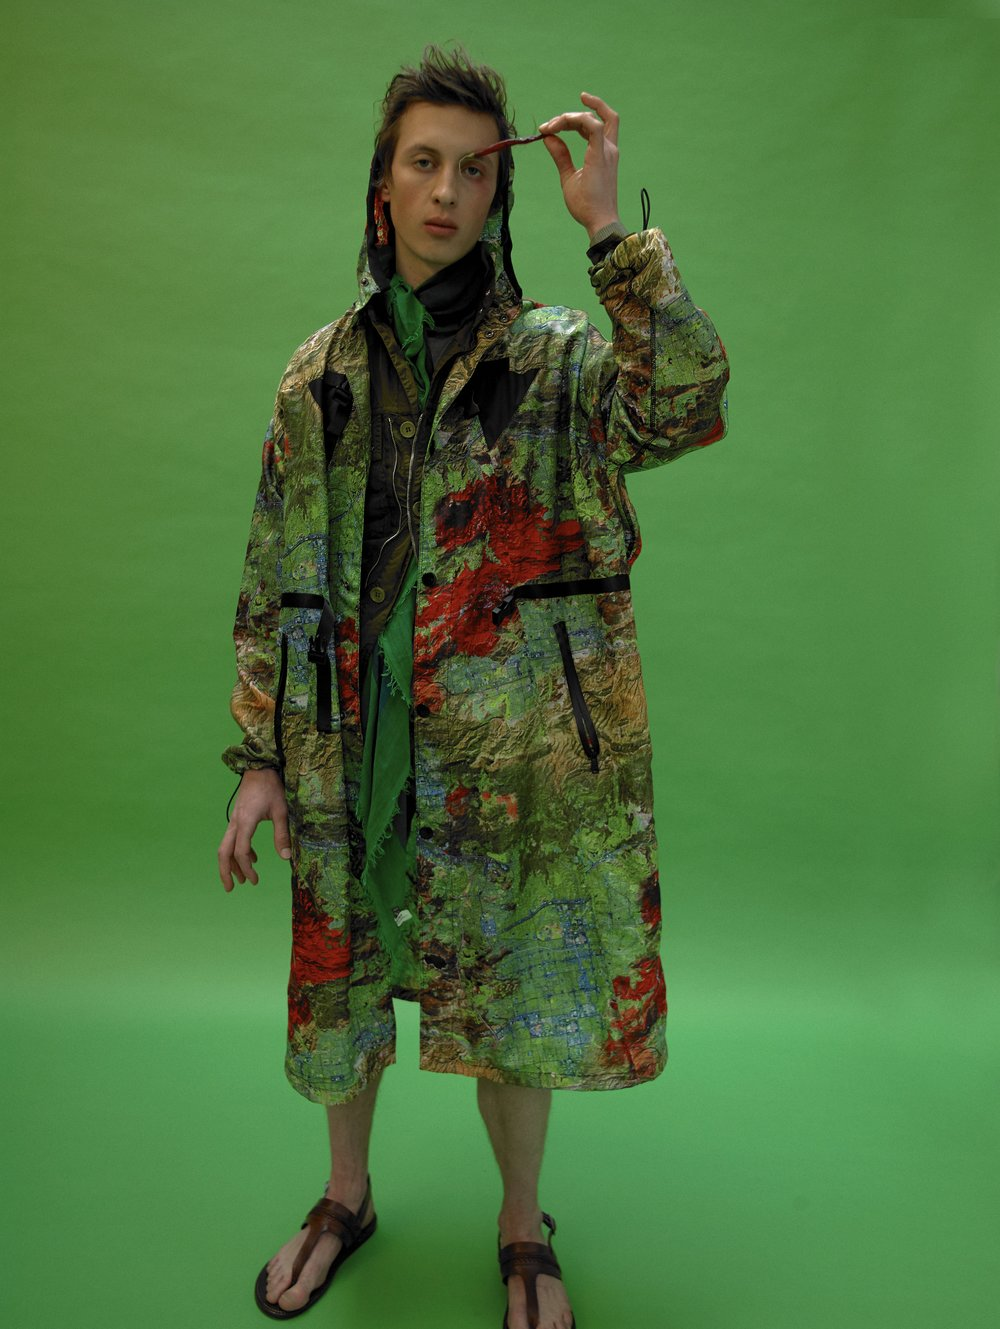 Abrigo de PRADA, chaqueta de PEUTEREY, bufanda de FALIERO SARTI y sandalias de ETRO.